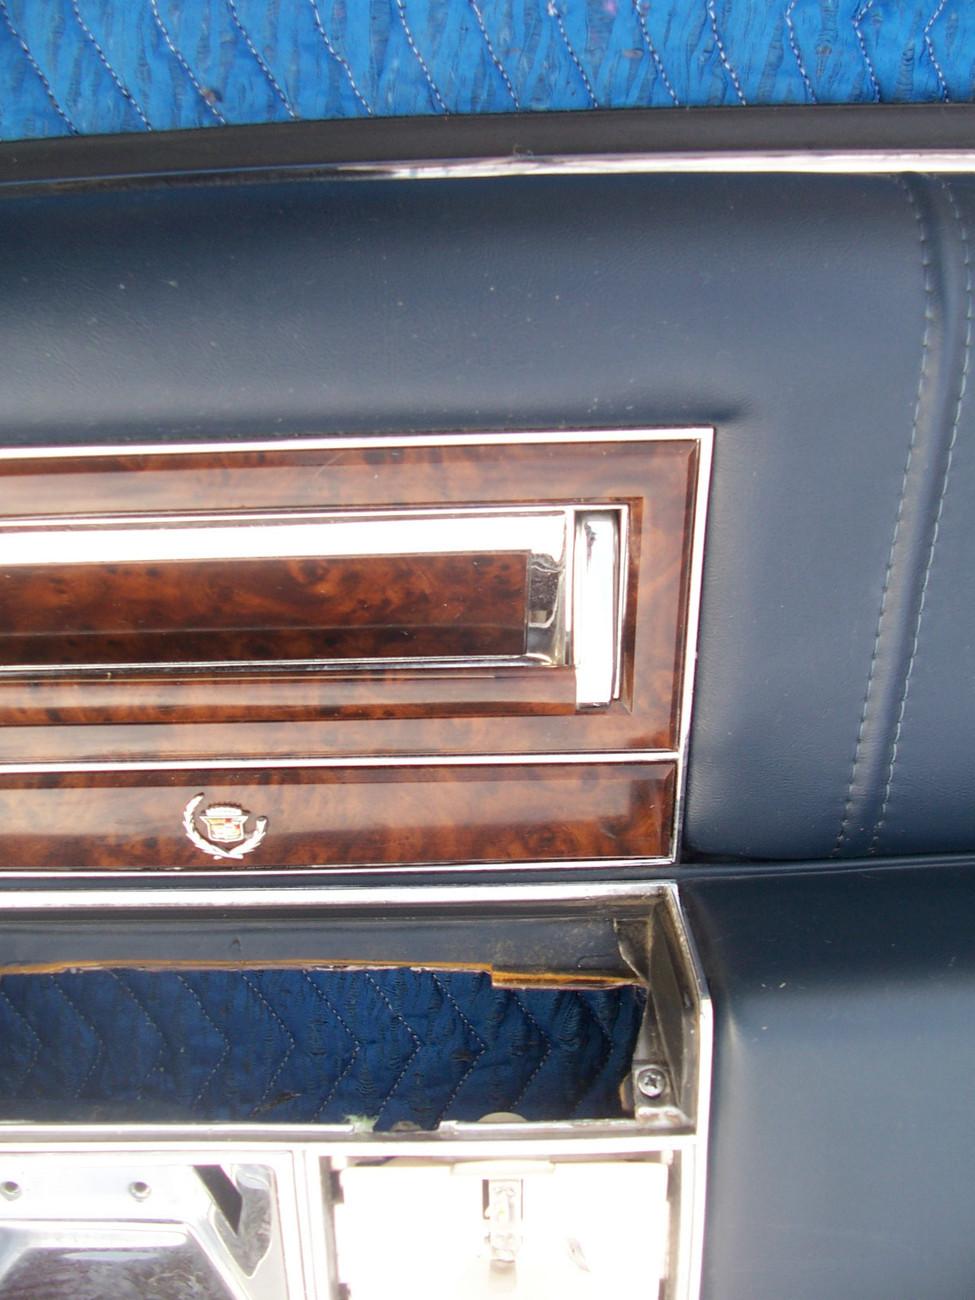 1990 CADILLAC BROUGHAM LEFT REAR BLUE DOOR PANEL OEM USED FLEETWOOD  1991 1992